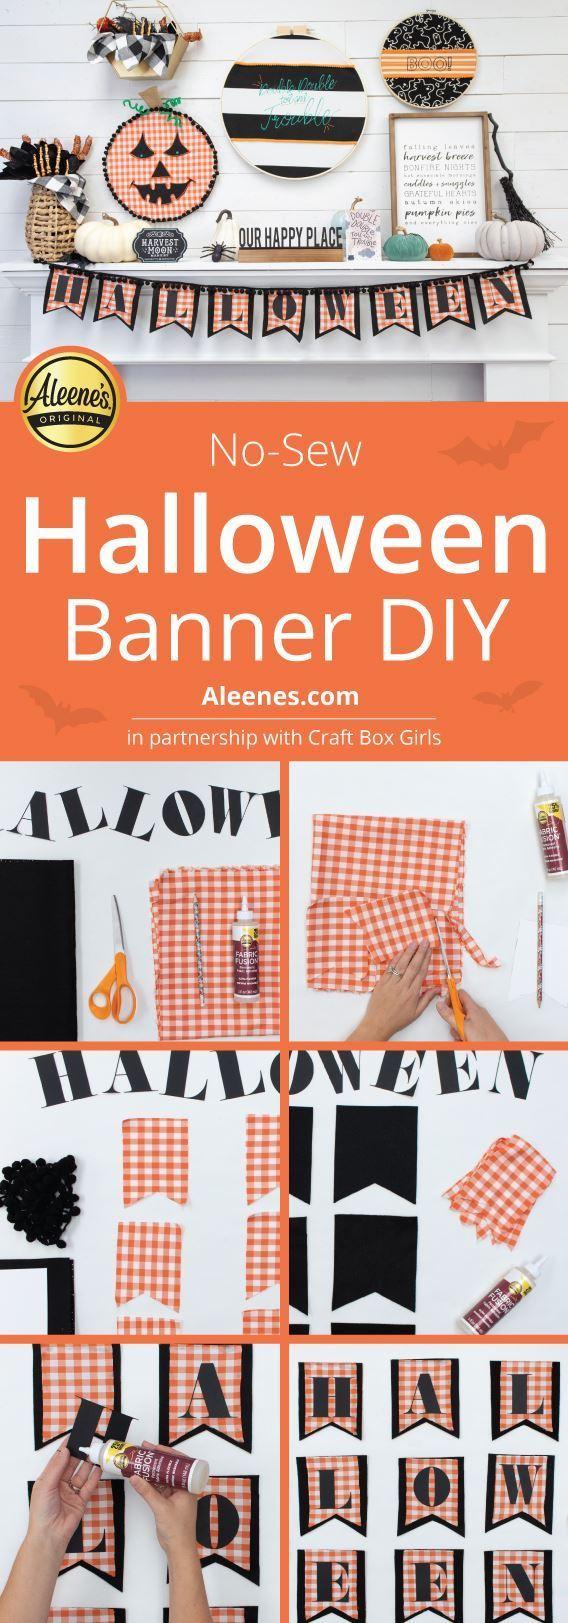 No-Sew Halloween Banner DIY